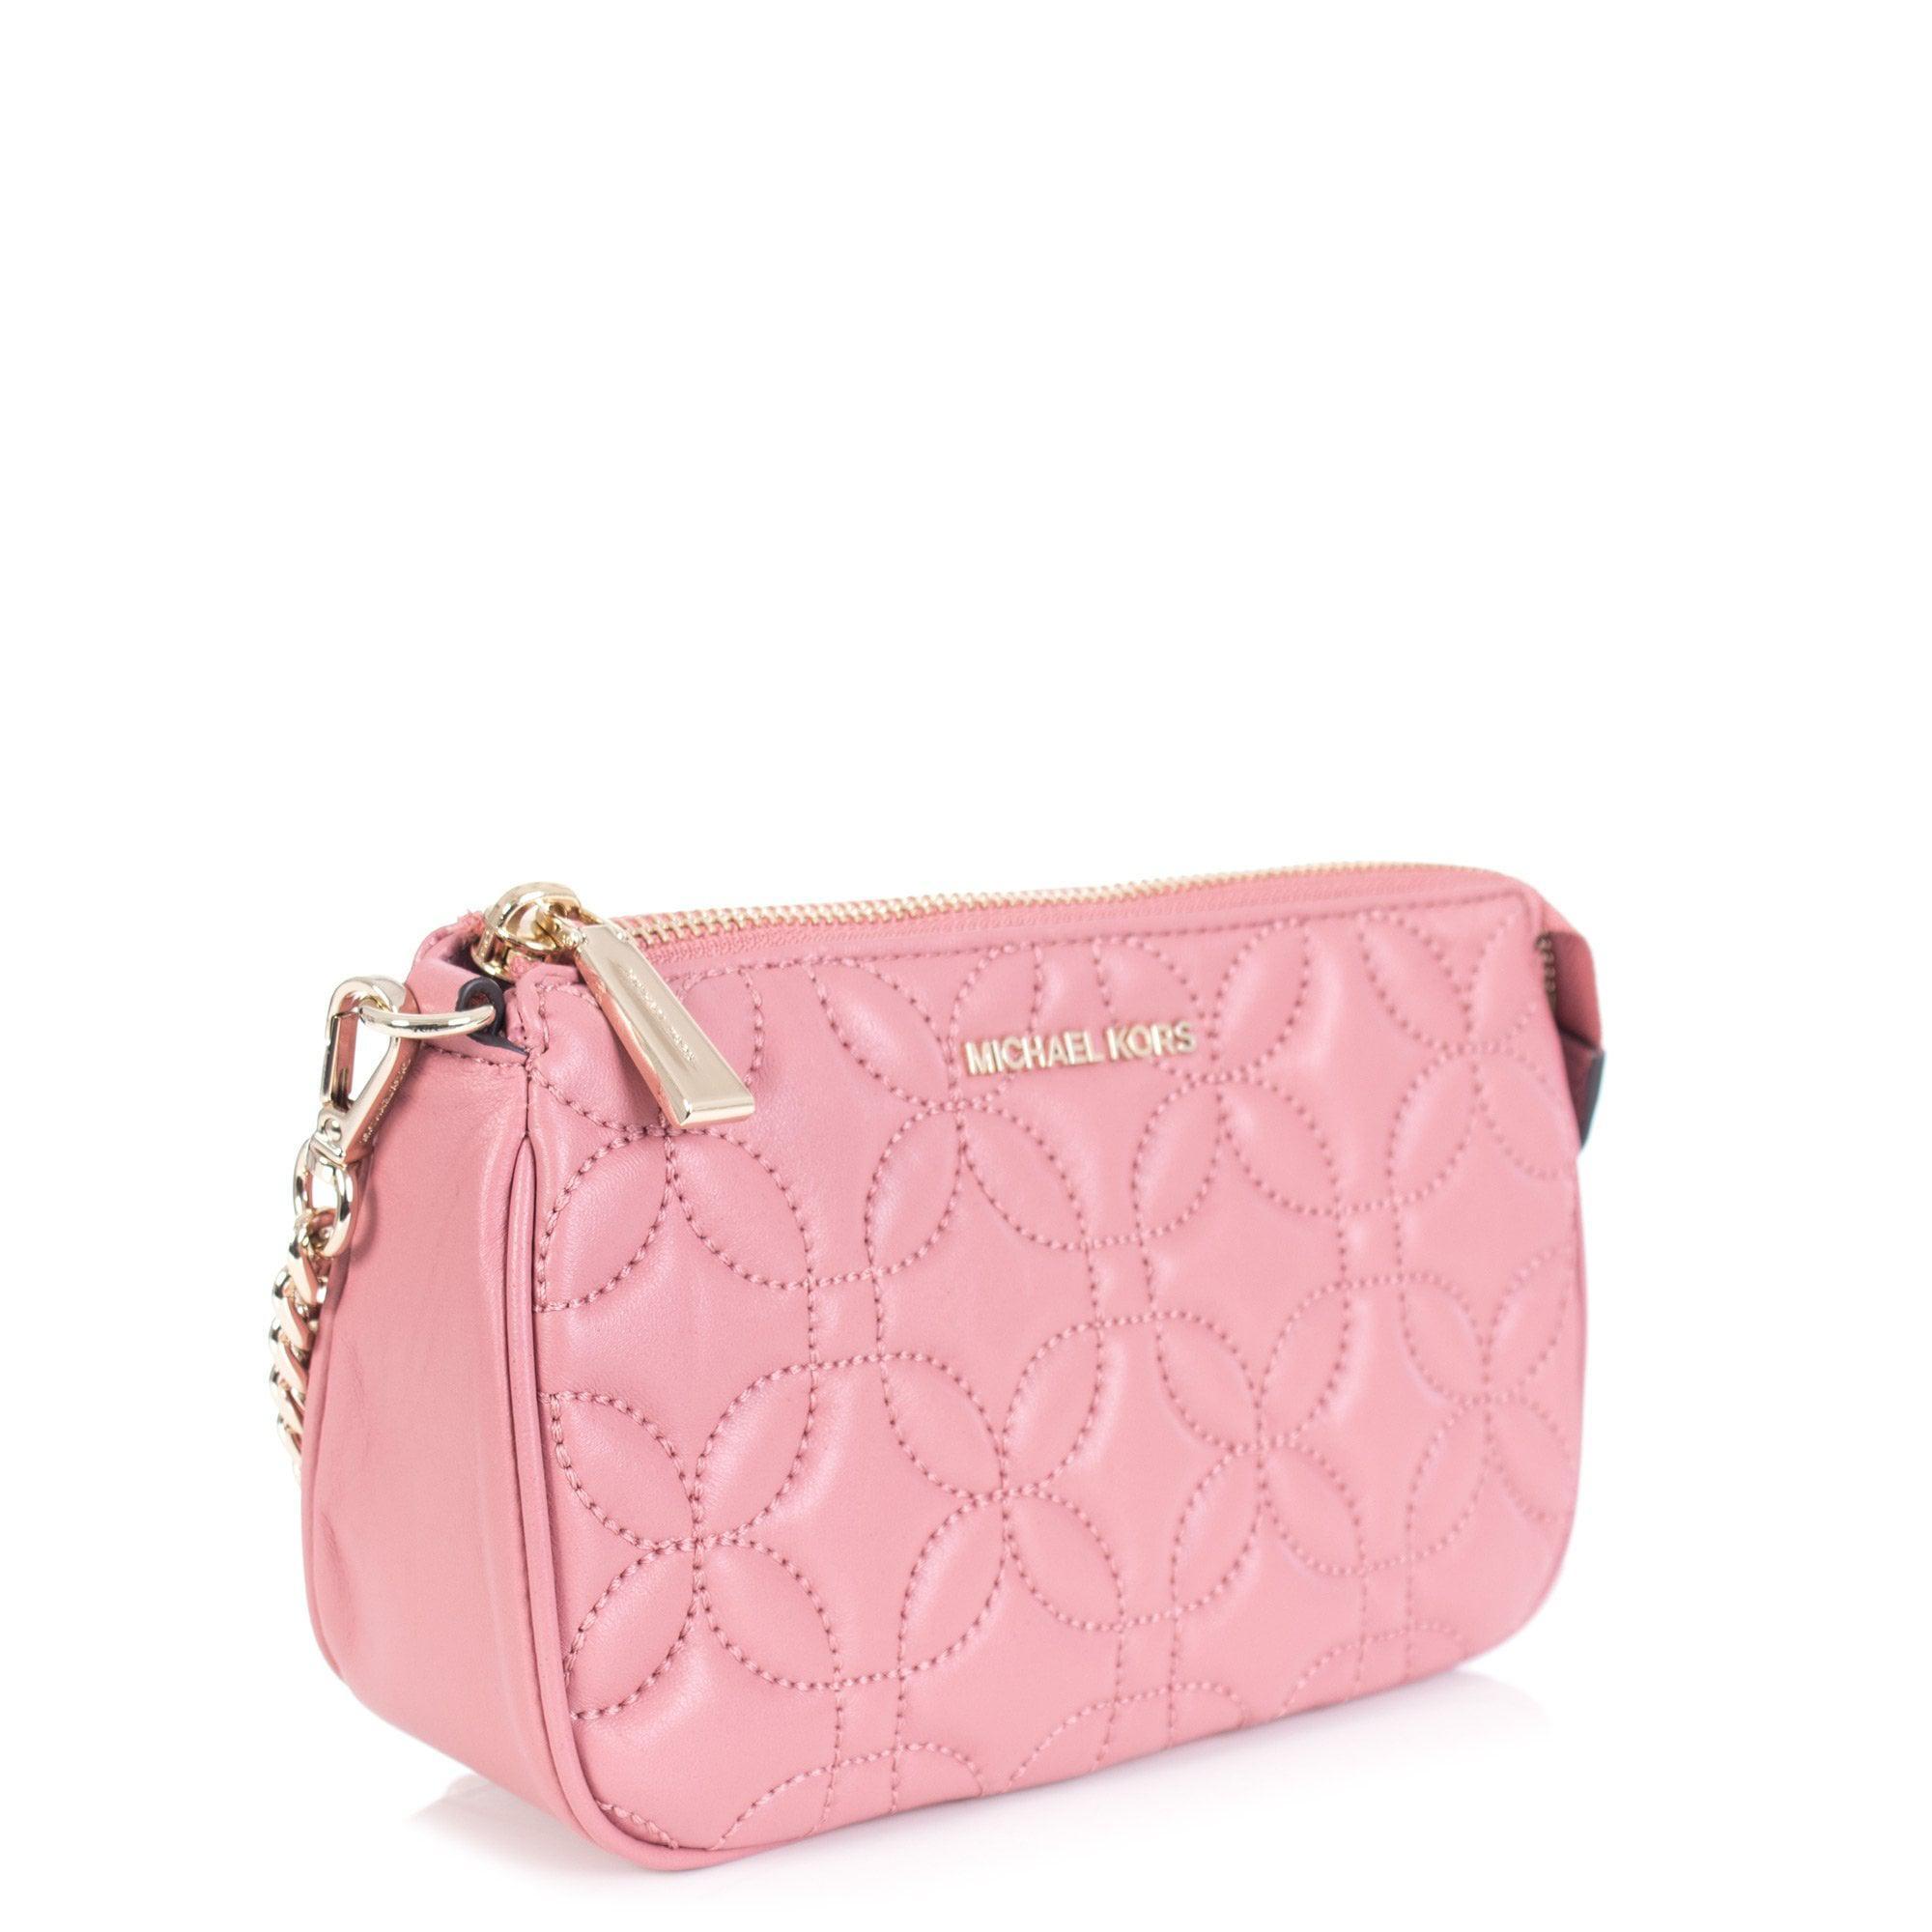 877df1560ffb Michael Kors - Pink Leather Chain Purse - Lyst. View fullscreen